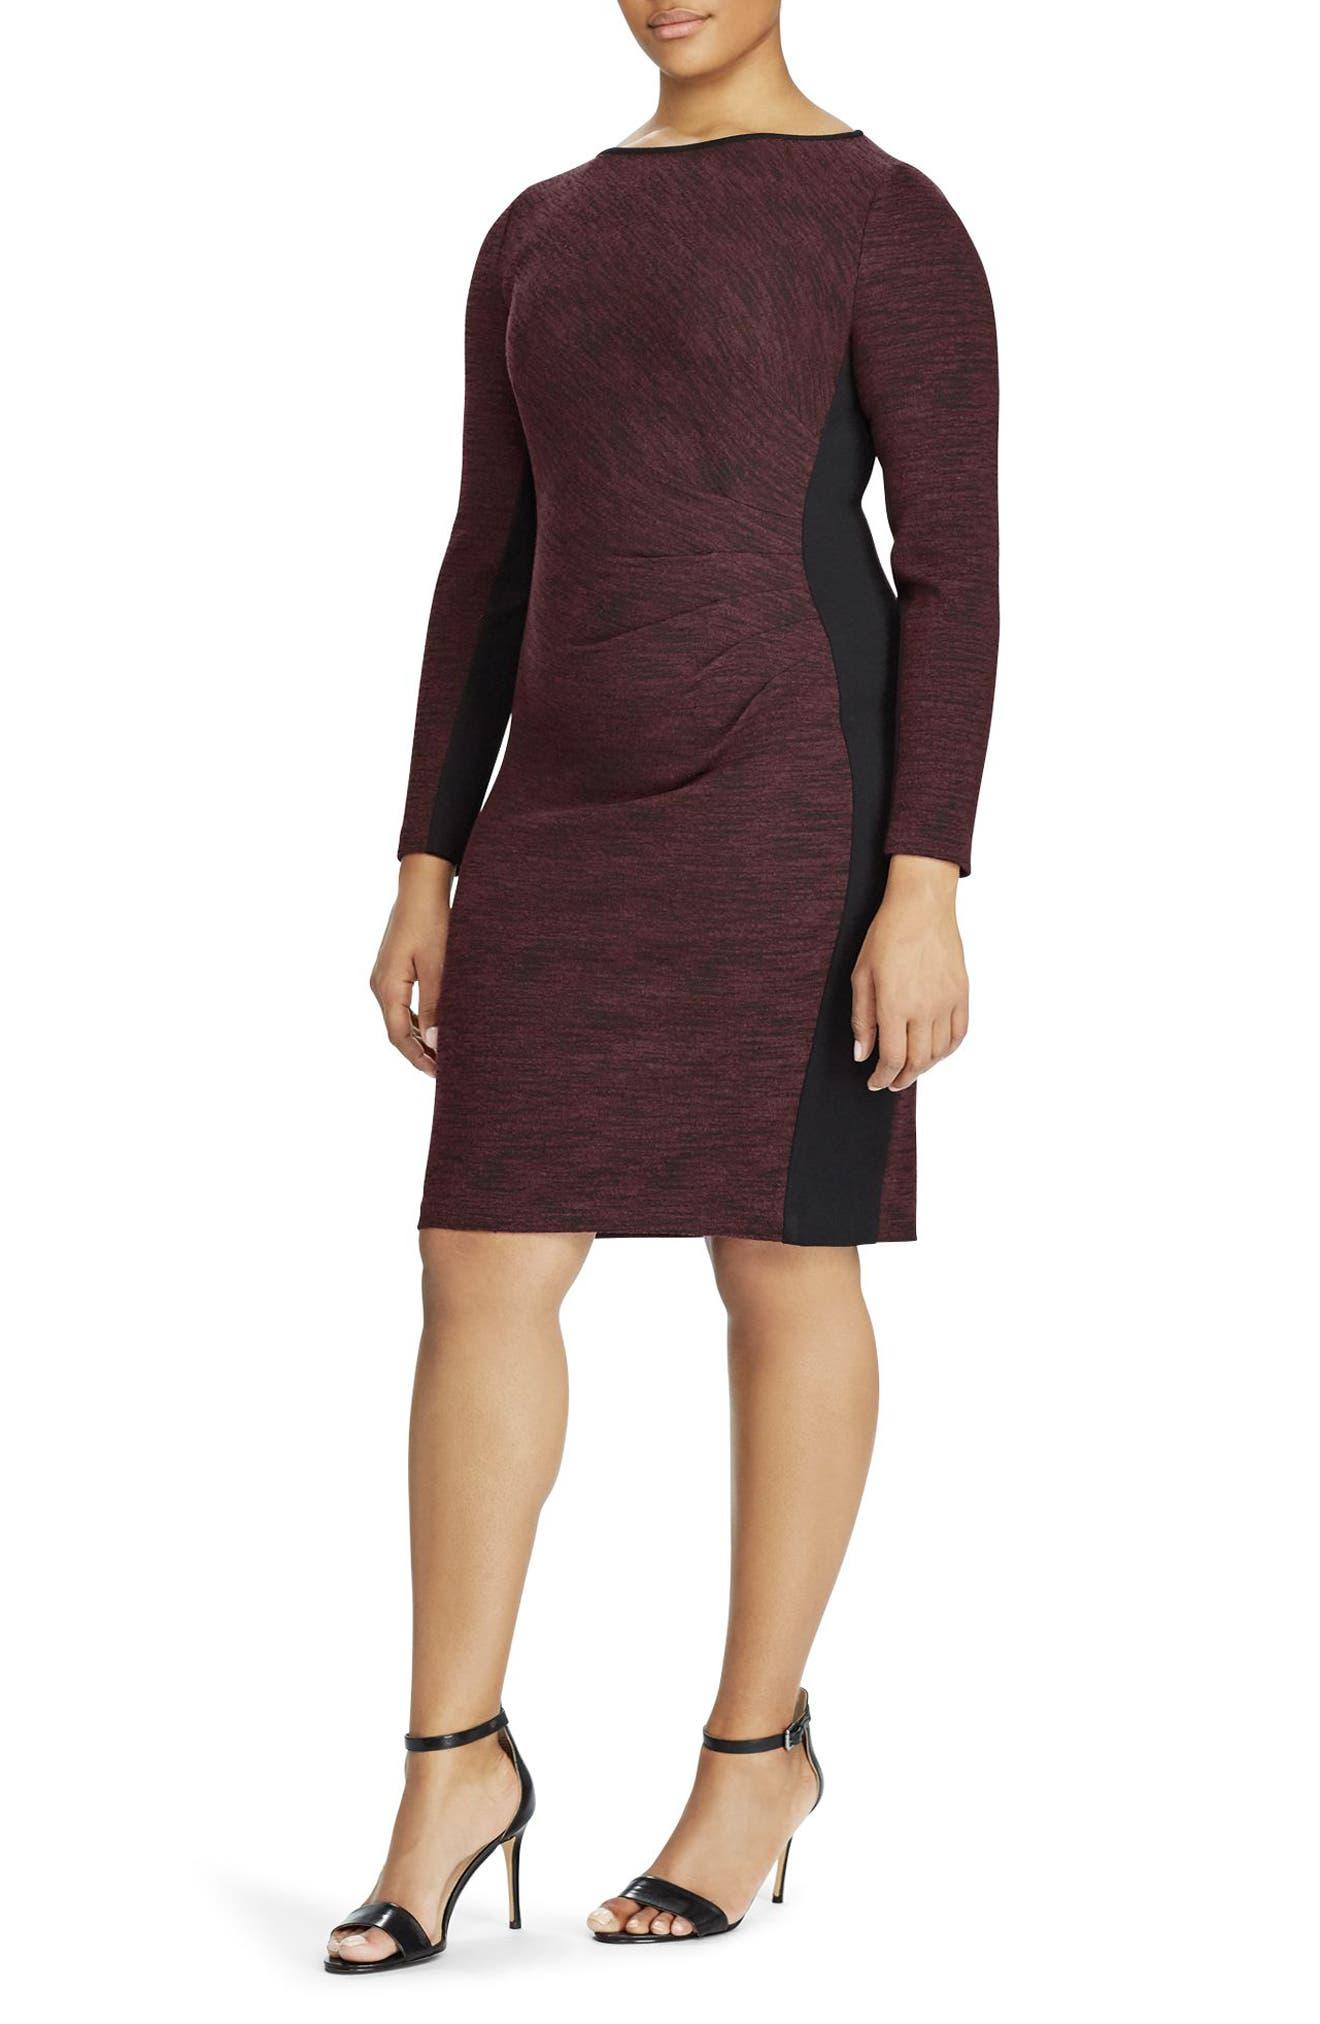 Alternate Image 1 Selected - Ralph Lauren Colorblock Sheath Dress (Plus Size)